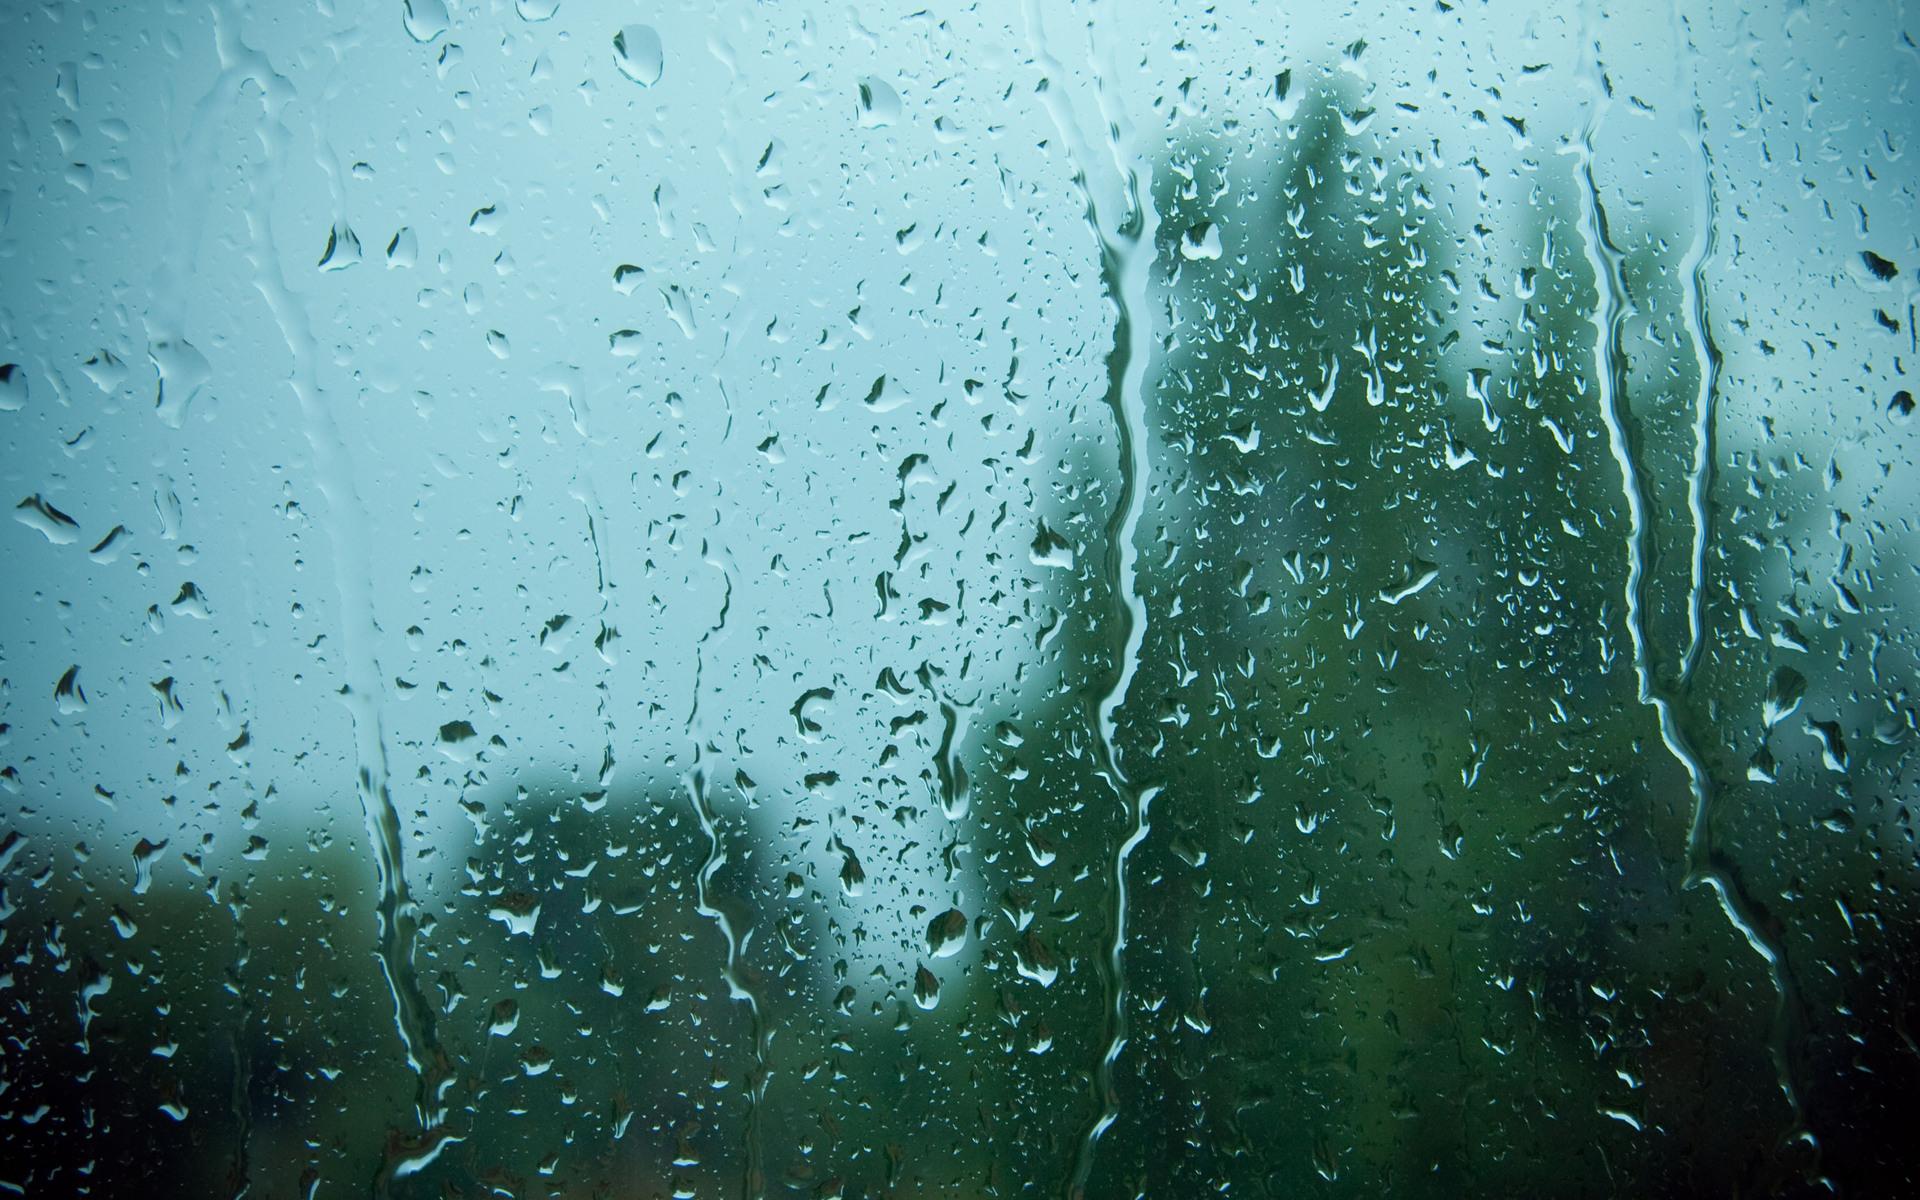 Rain on Window HD wallpaper 1920x1200